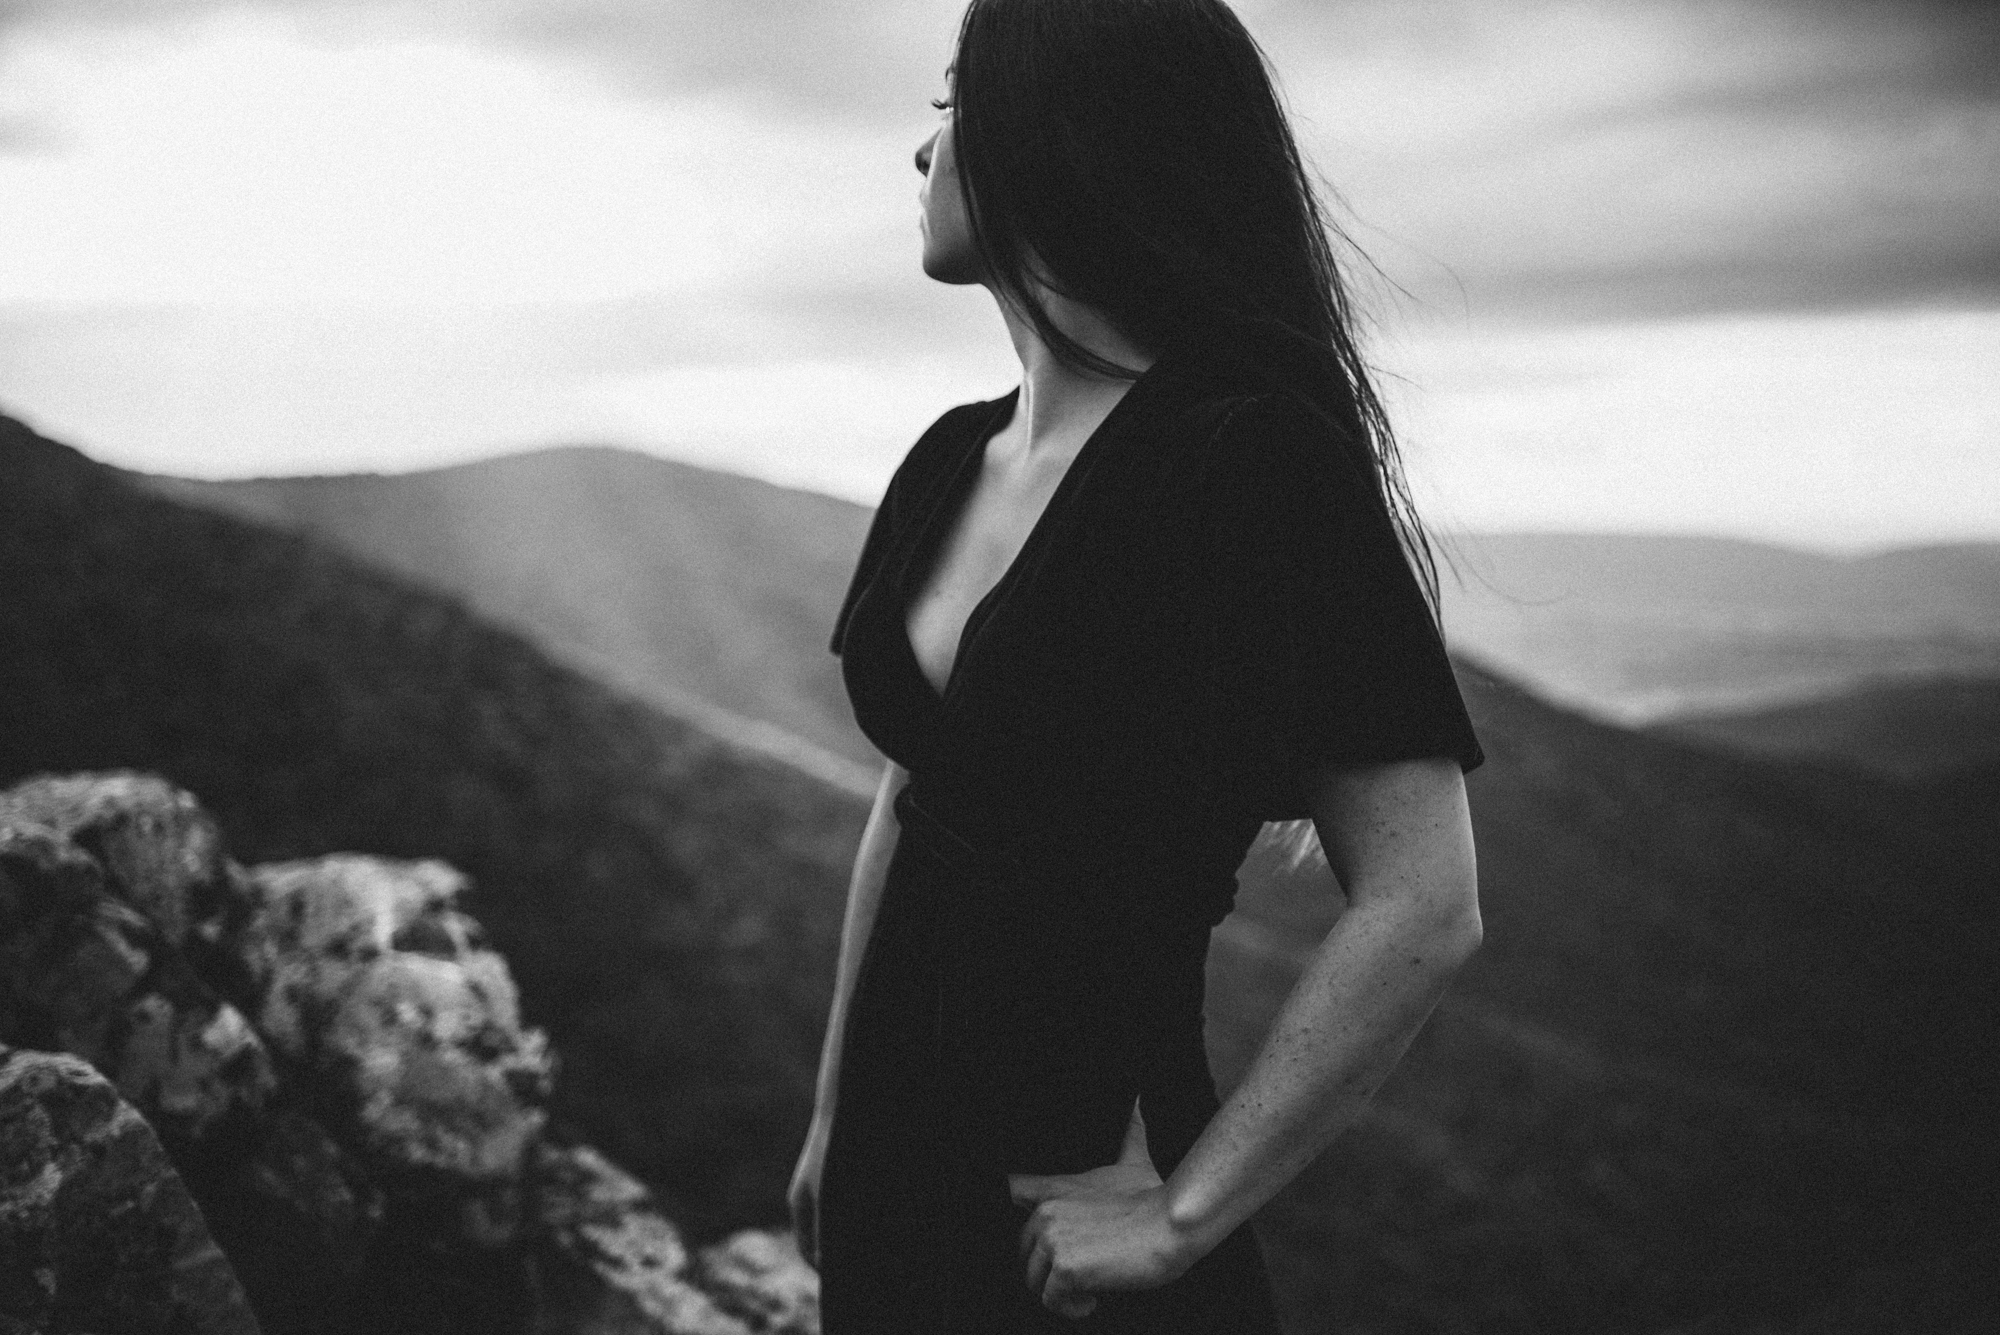 Megan_Shenandoah_National_Park_Windy_Romantic_Portraits_84.JPG